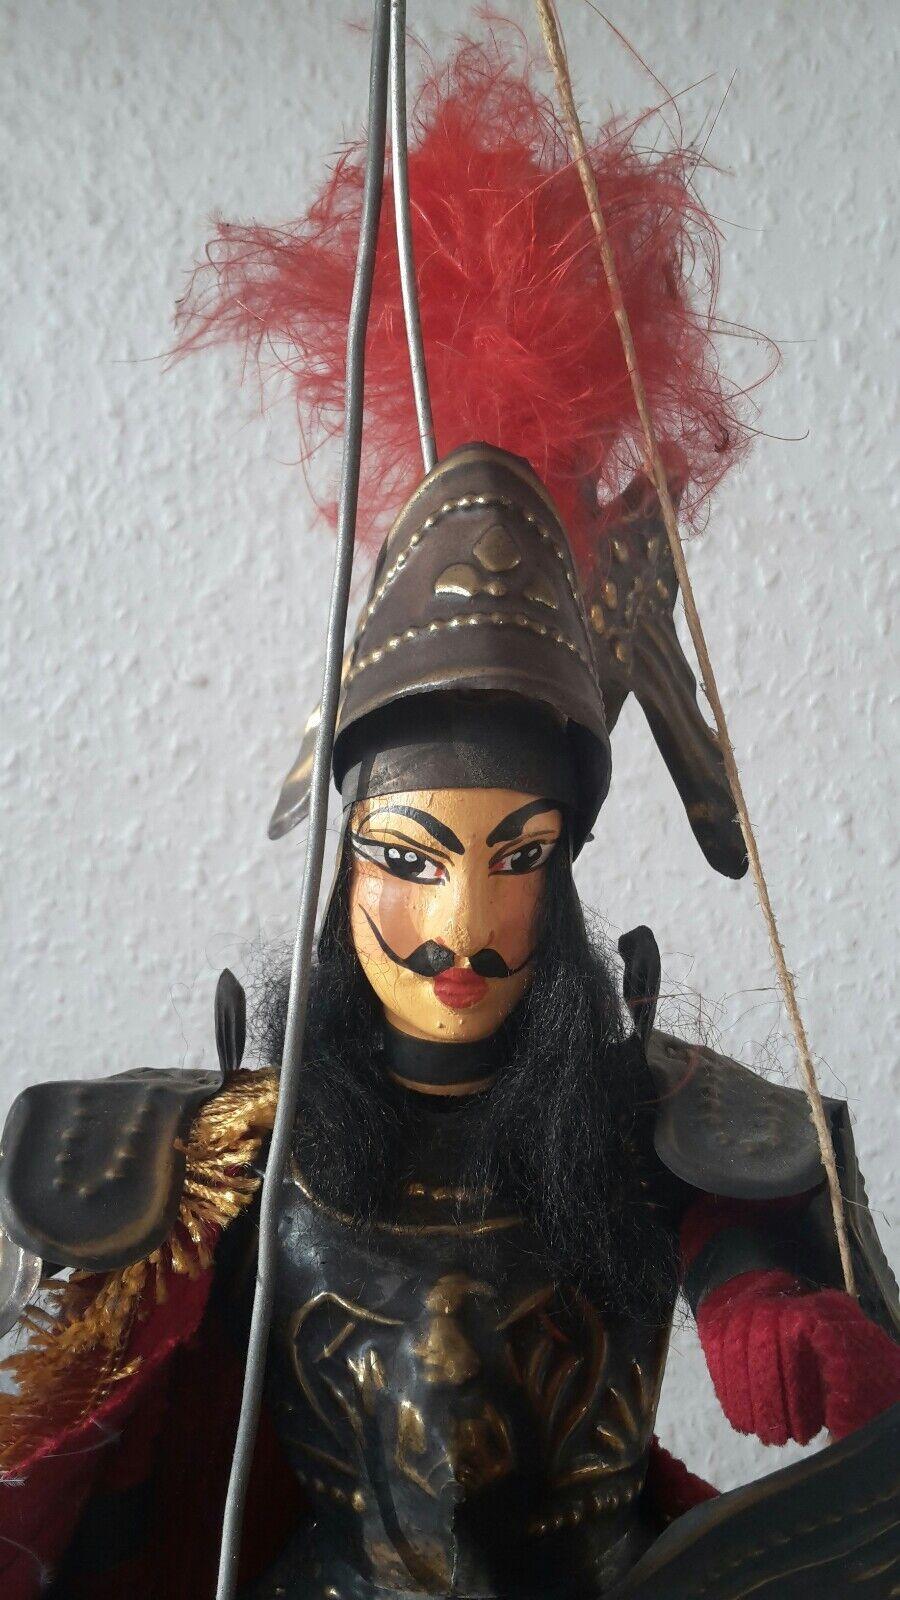 Marionette Ritter aus Sizilien Orlando Manufaktur Lanzafame Sebastiano rot 6